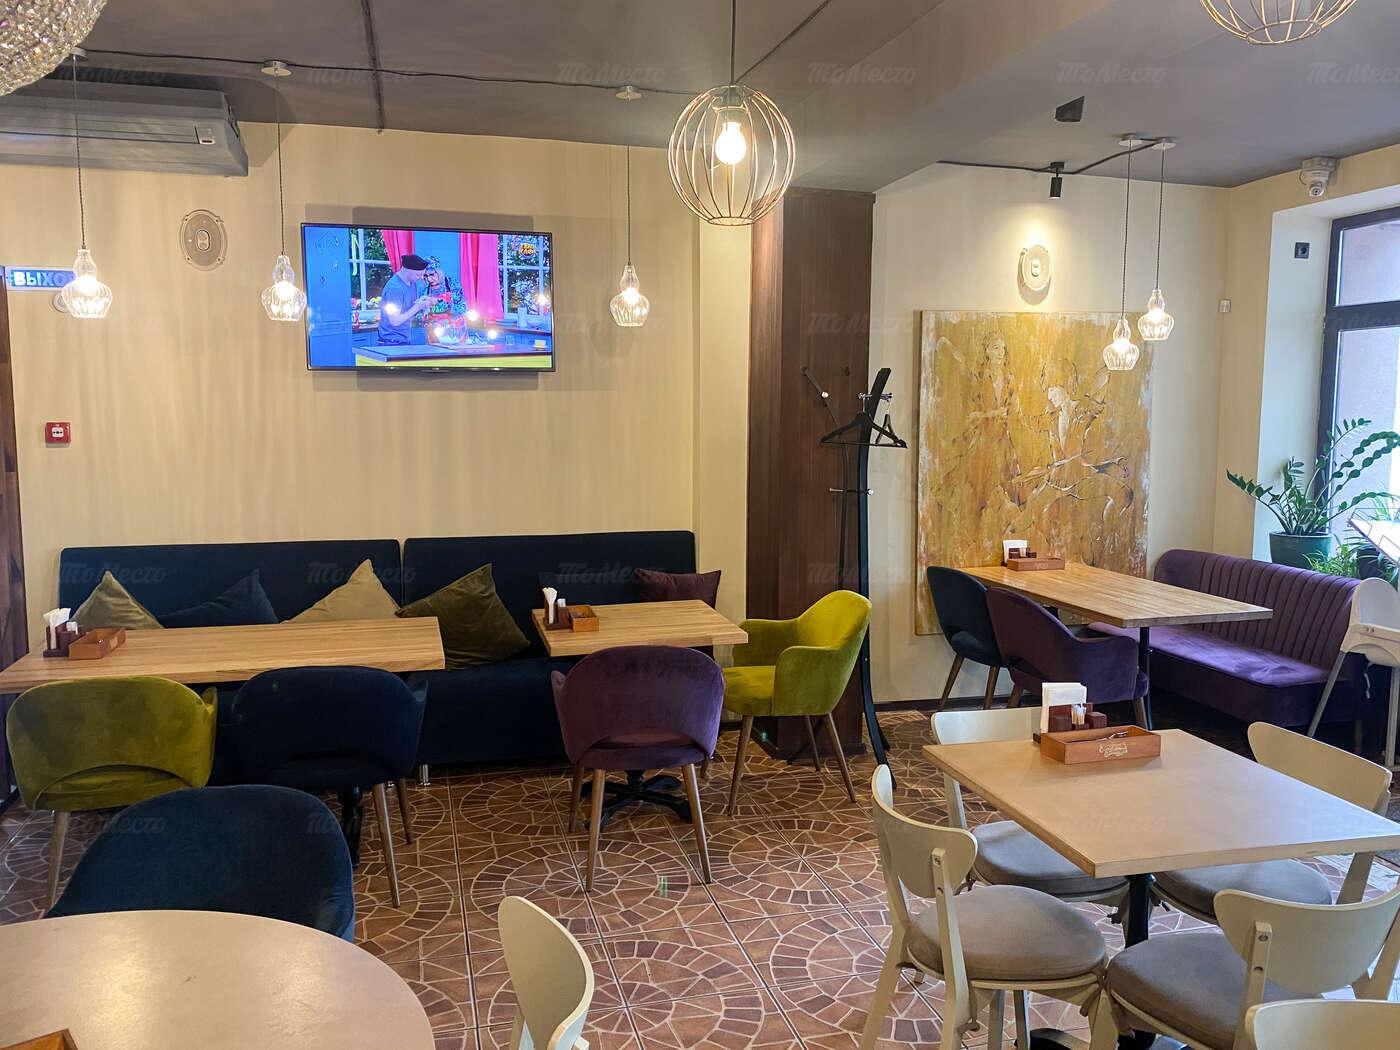 Банкеты кафе Хинкали & Хачапури на Ленина фото 7